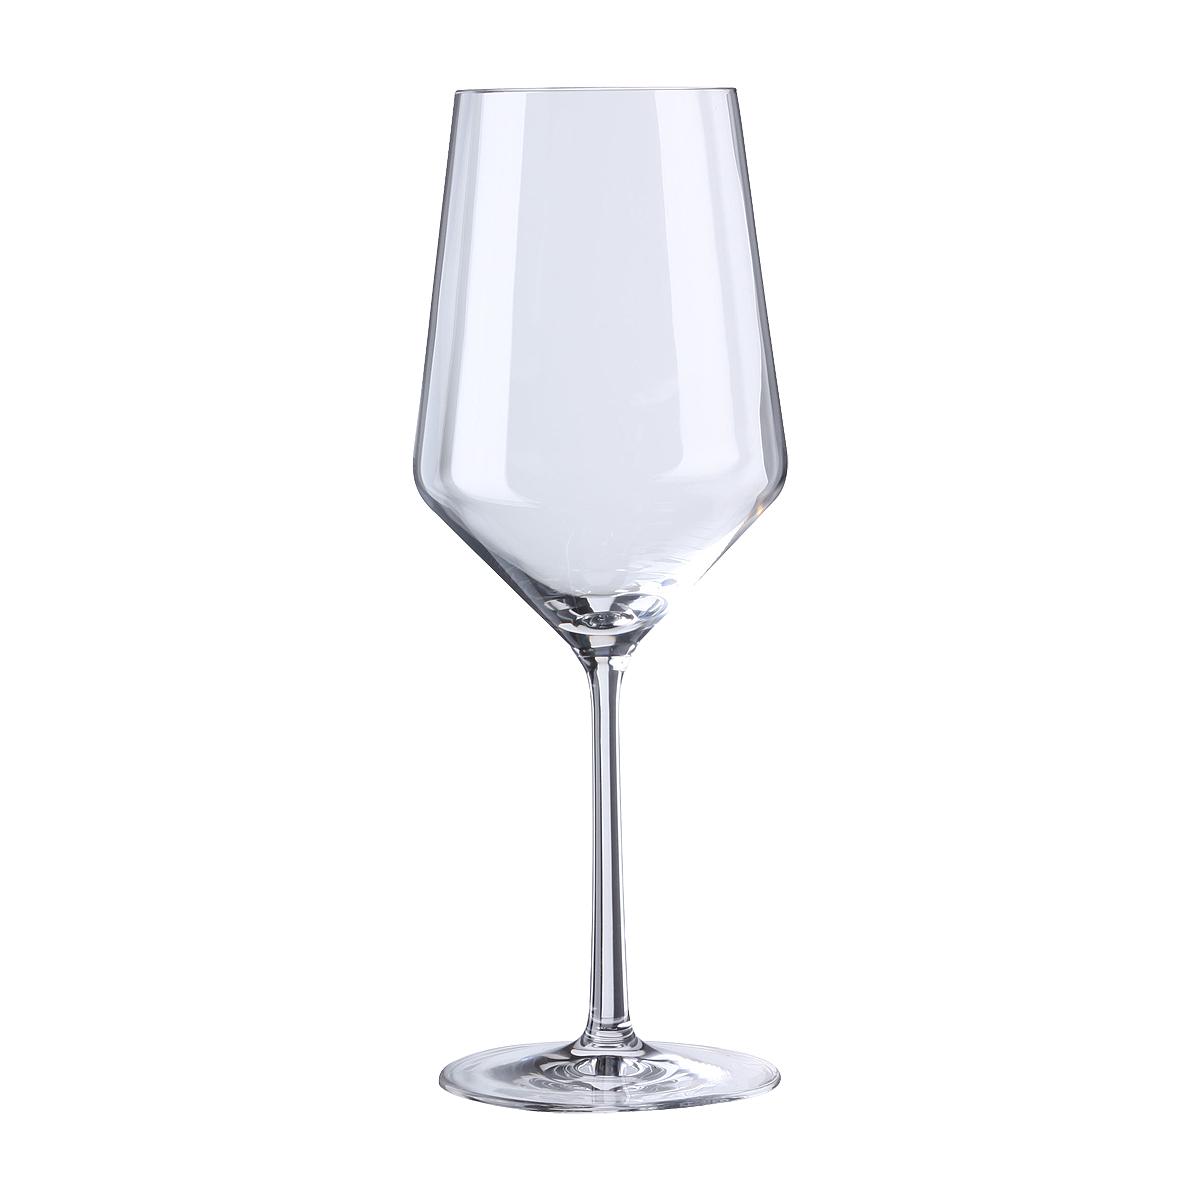 Набор бокалов для красного вина Schott Zwiesel PURE, объем 0,54 л, прозрачный, 6 штук Schott Zwiesel 112413_6шт фото 1